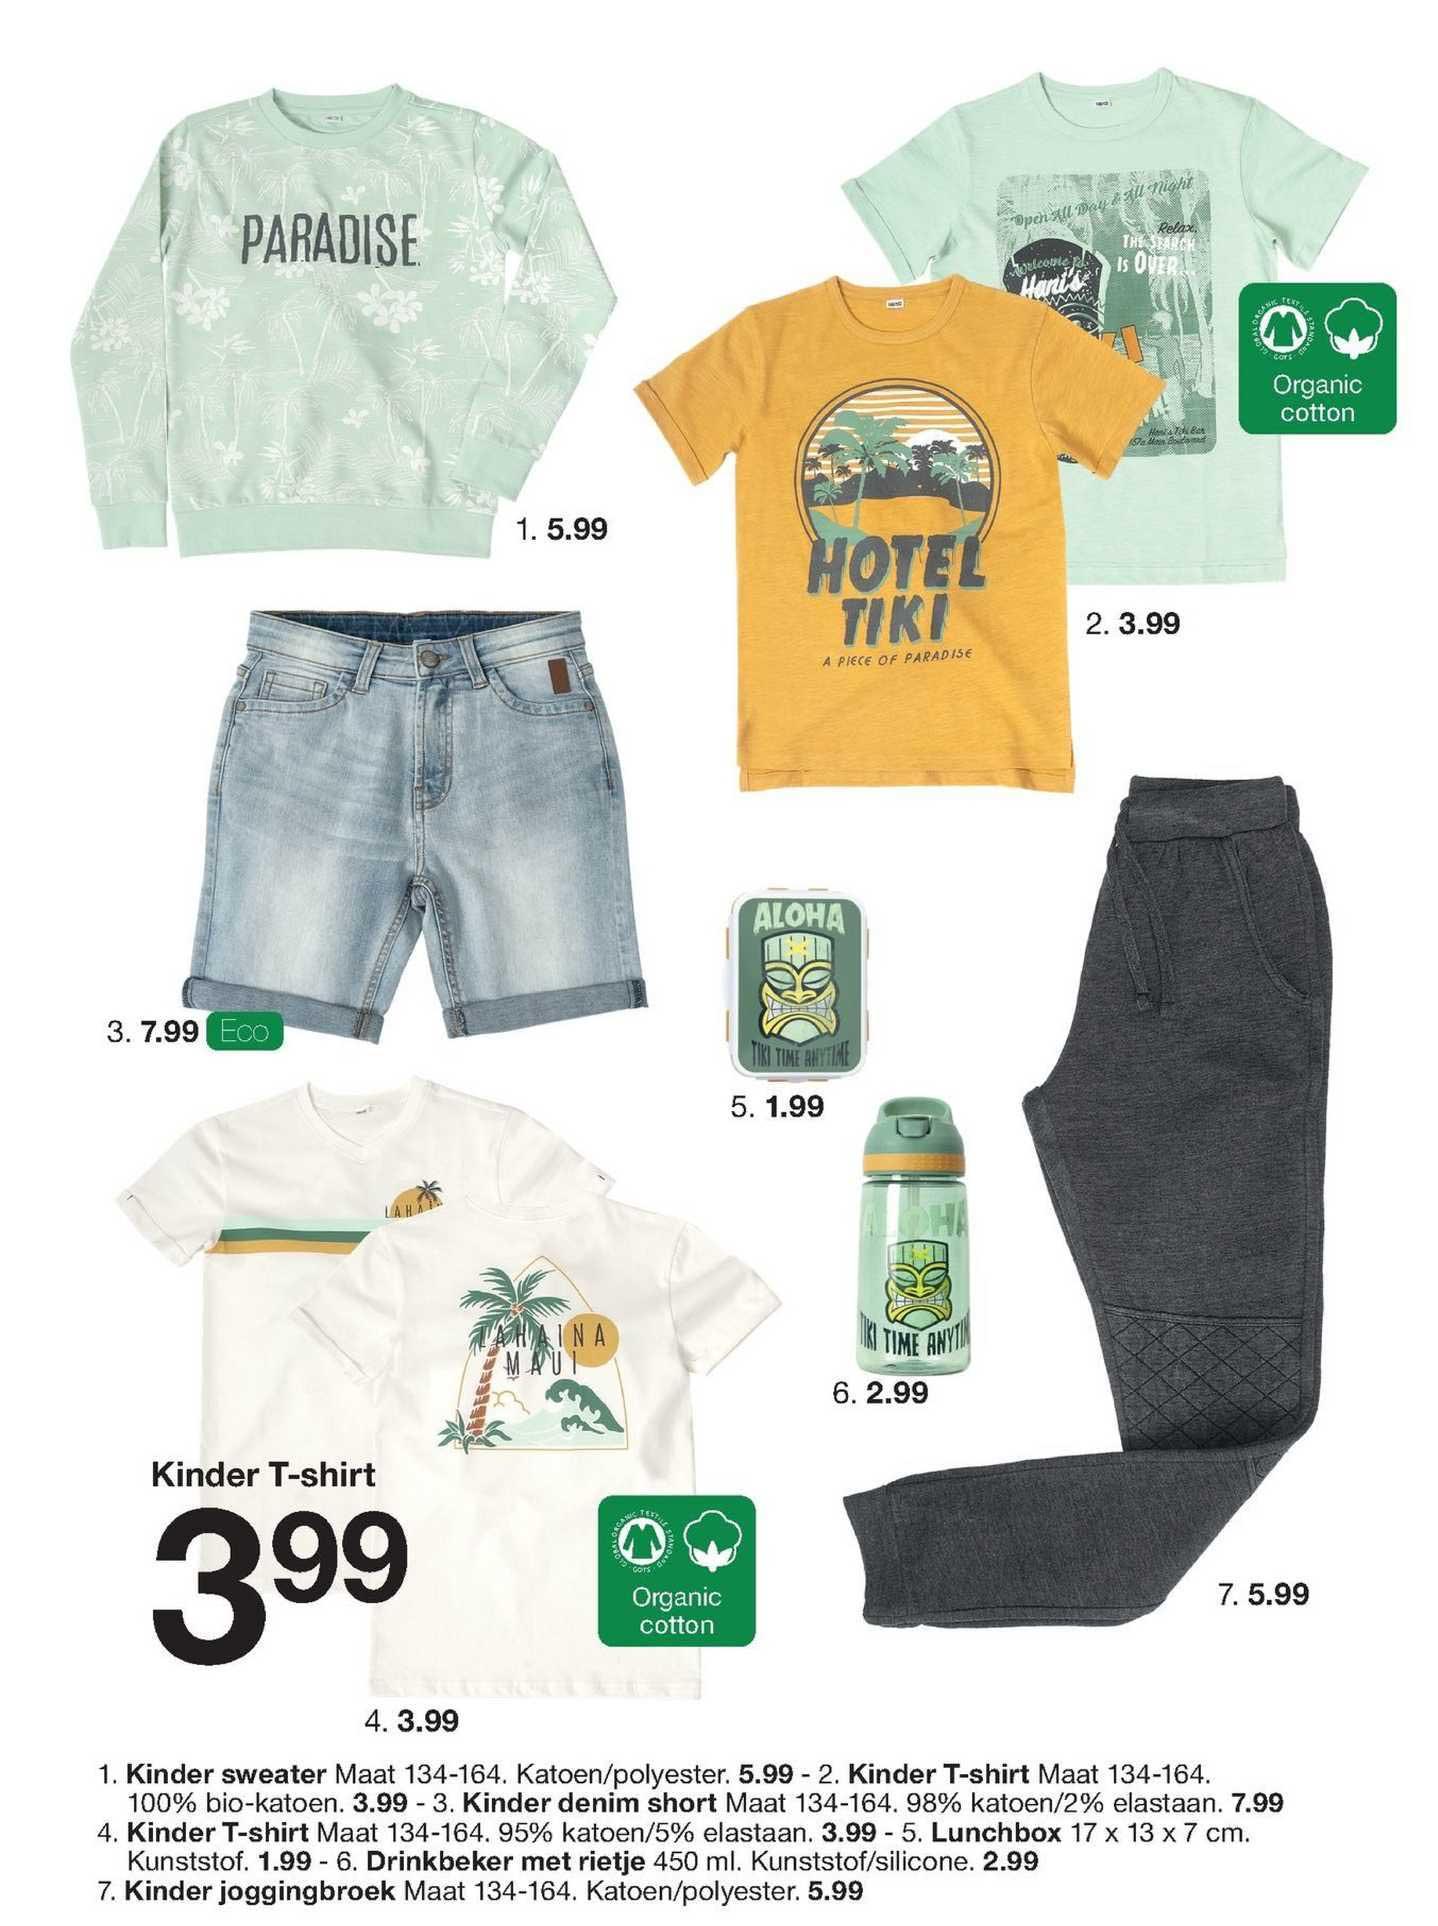 Zeeman Kinder Sweater, Kinder T-Shirt, Kinder Denim Short, Lunchbox, Drinkbeker Met Rietje Of Kinder Joggingbroek